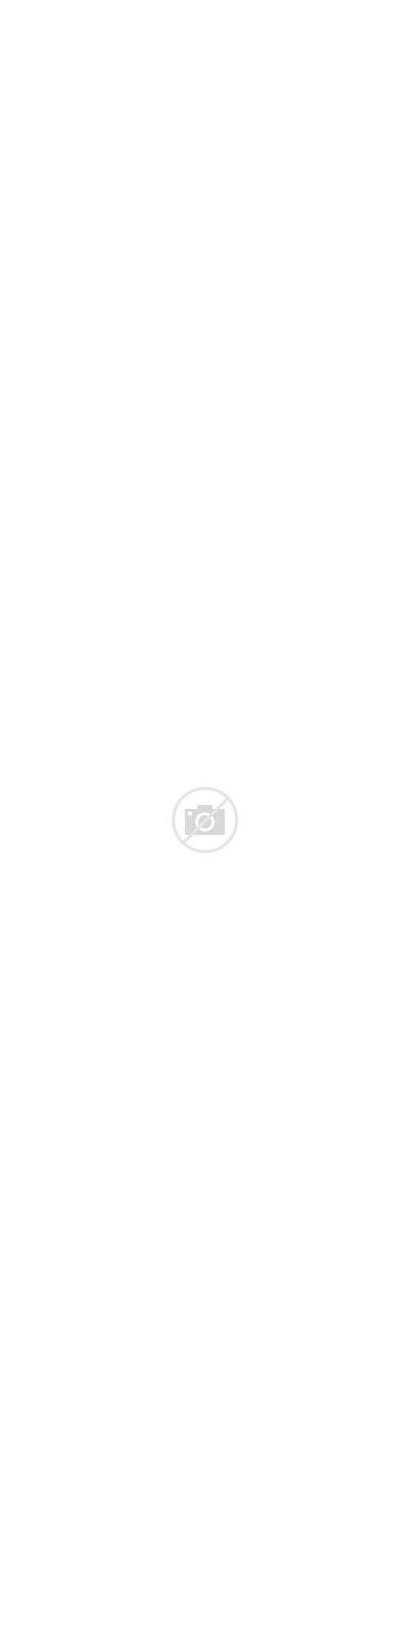 Future Present Service Customer Past Infographic